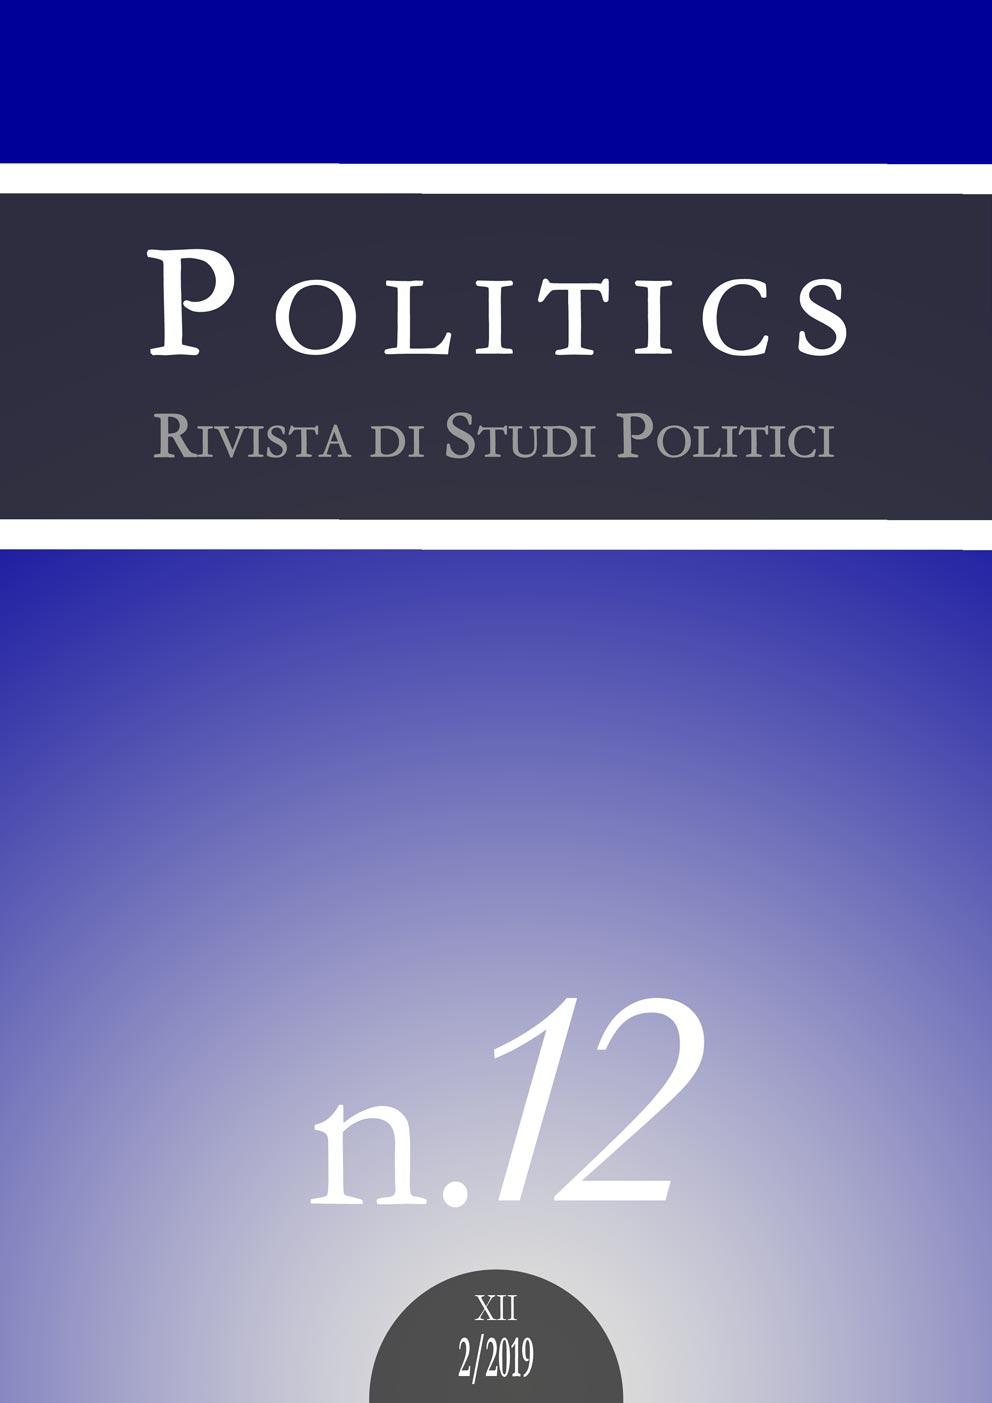 copertina_politics_12[1].jpg